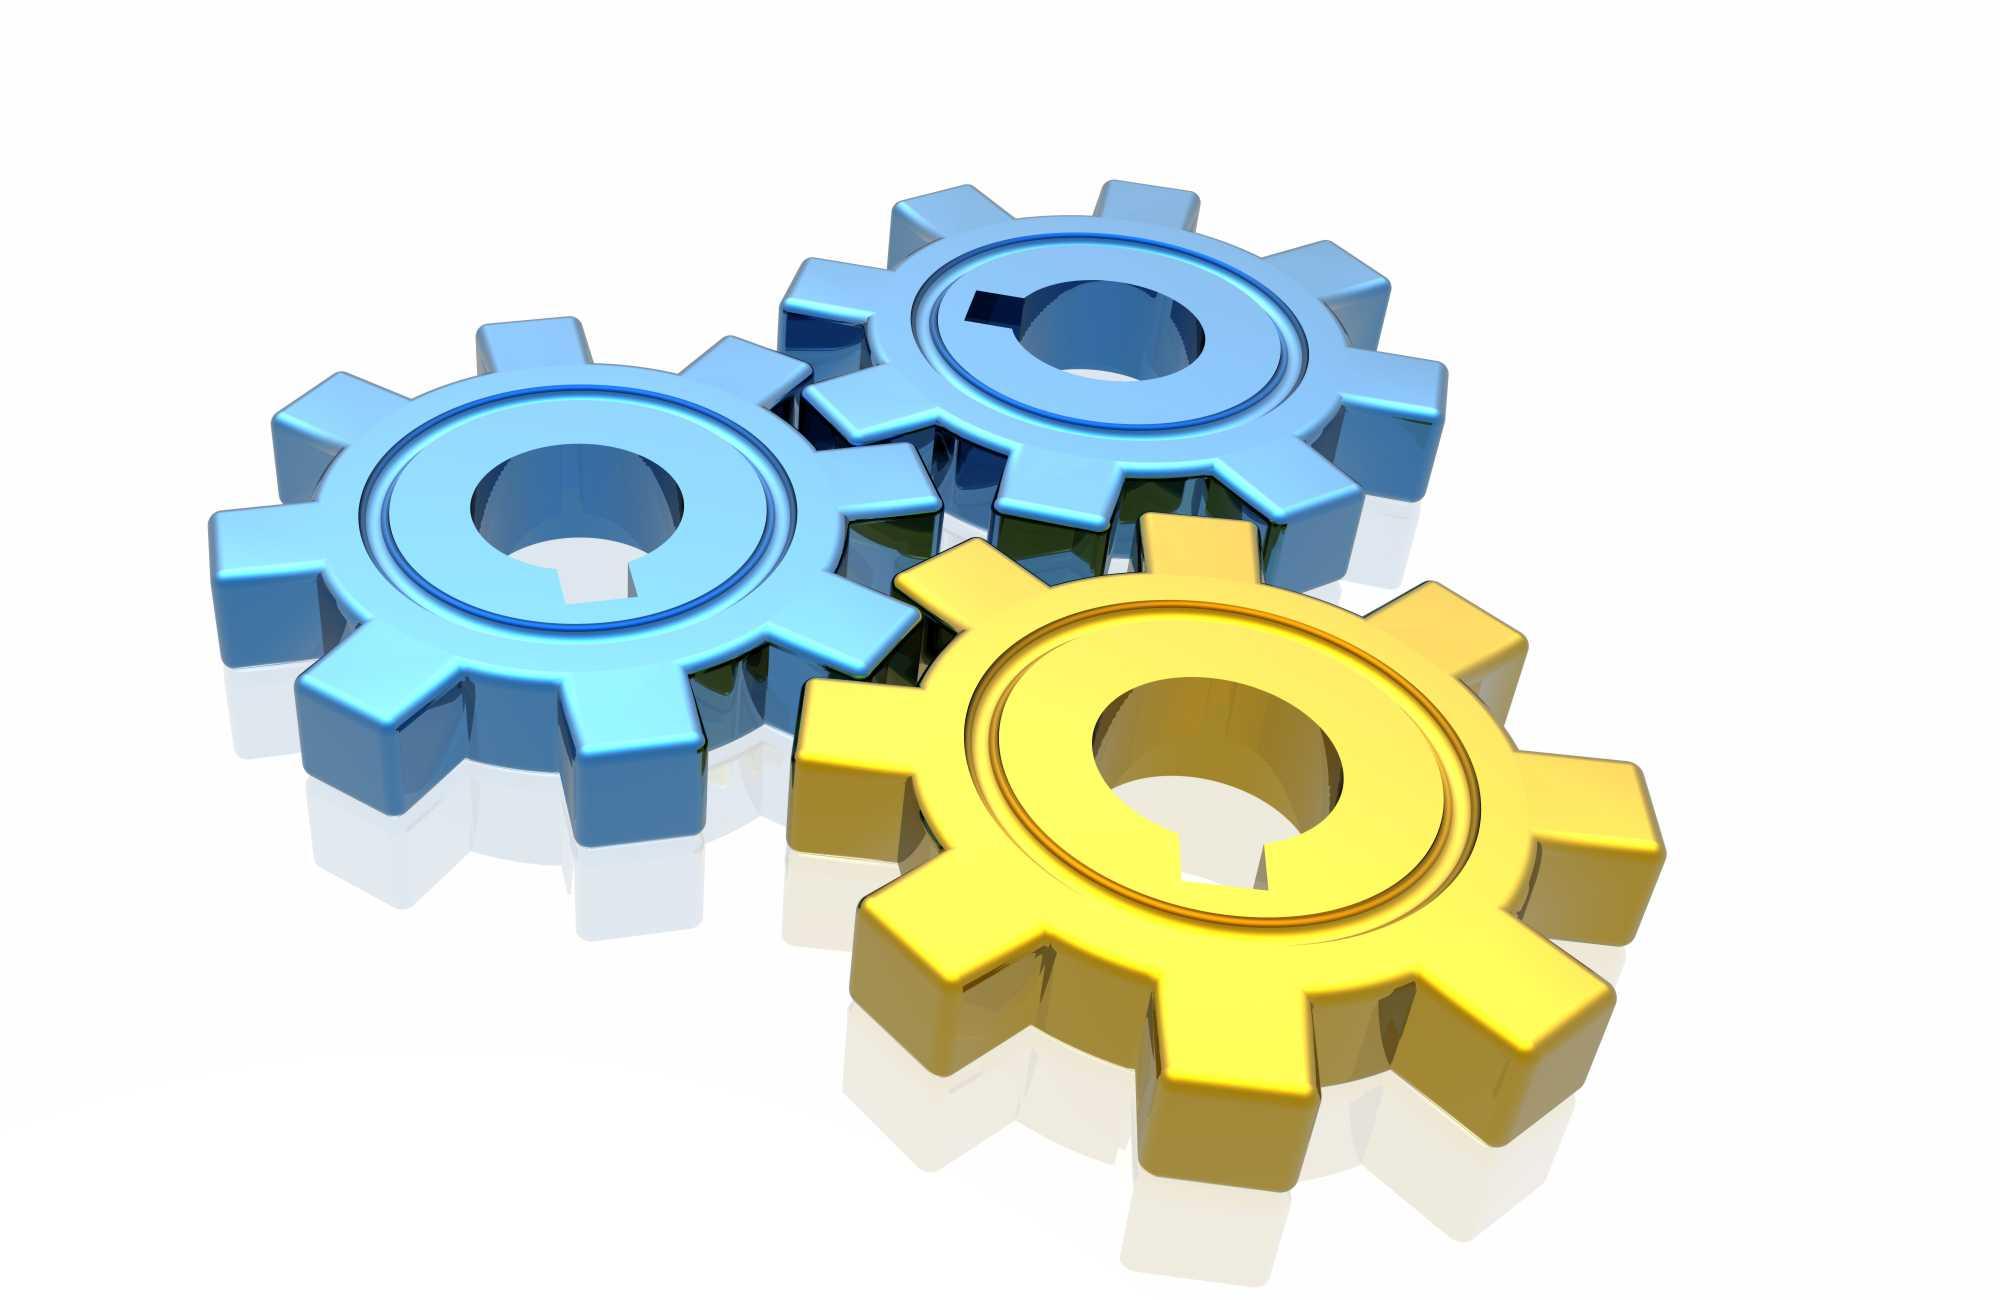 13-1300-1800-number-setup-routing-diversion-options-hero-240418.jpg